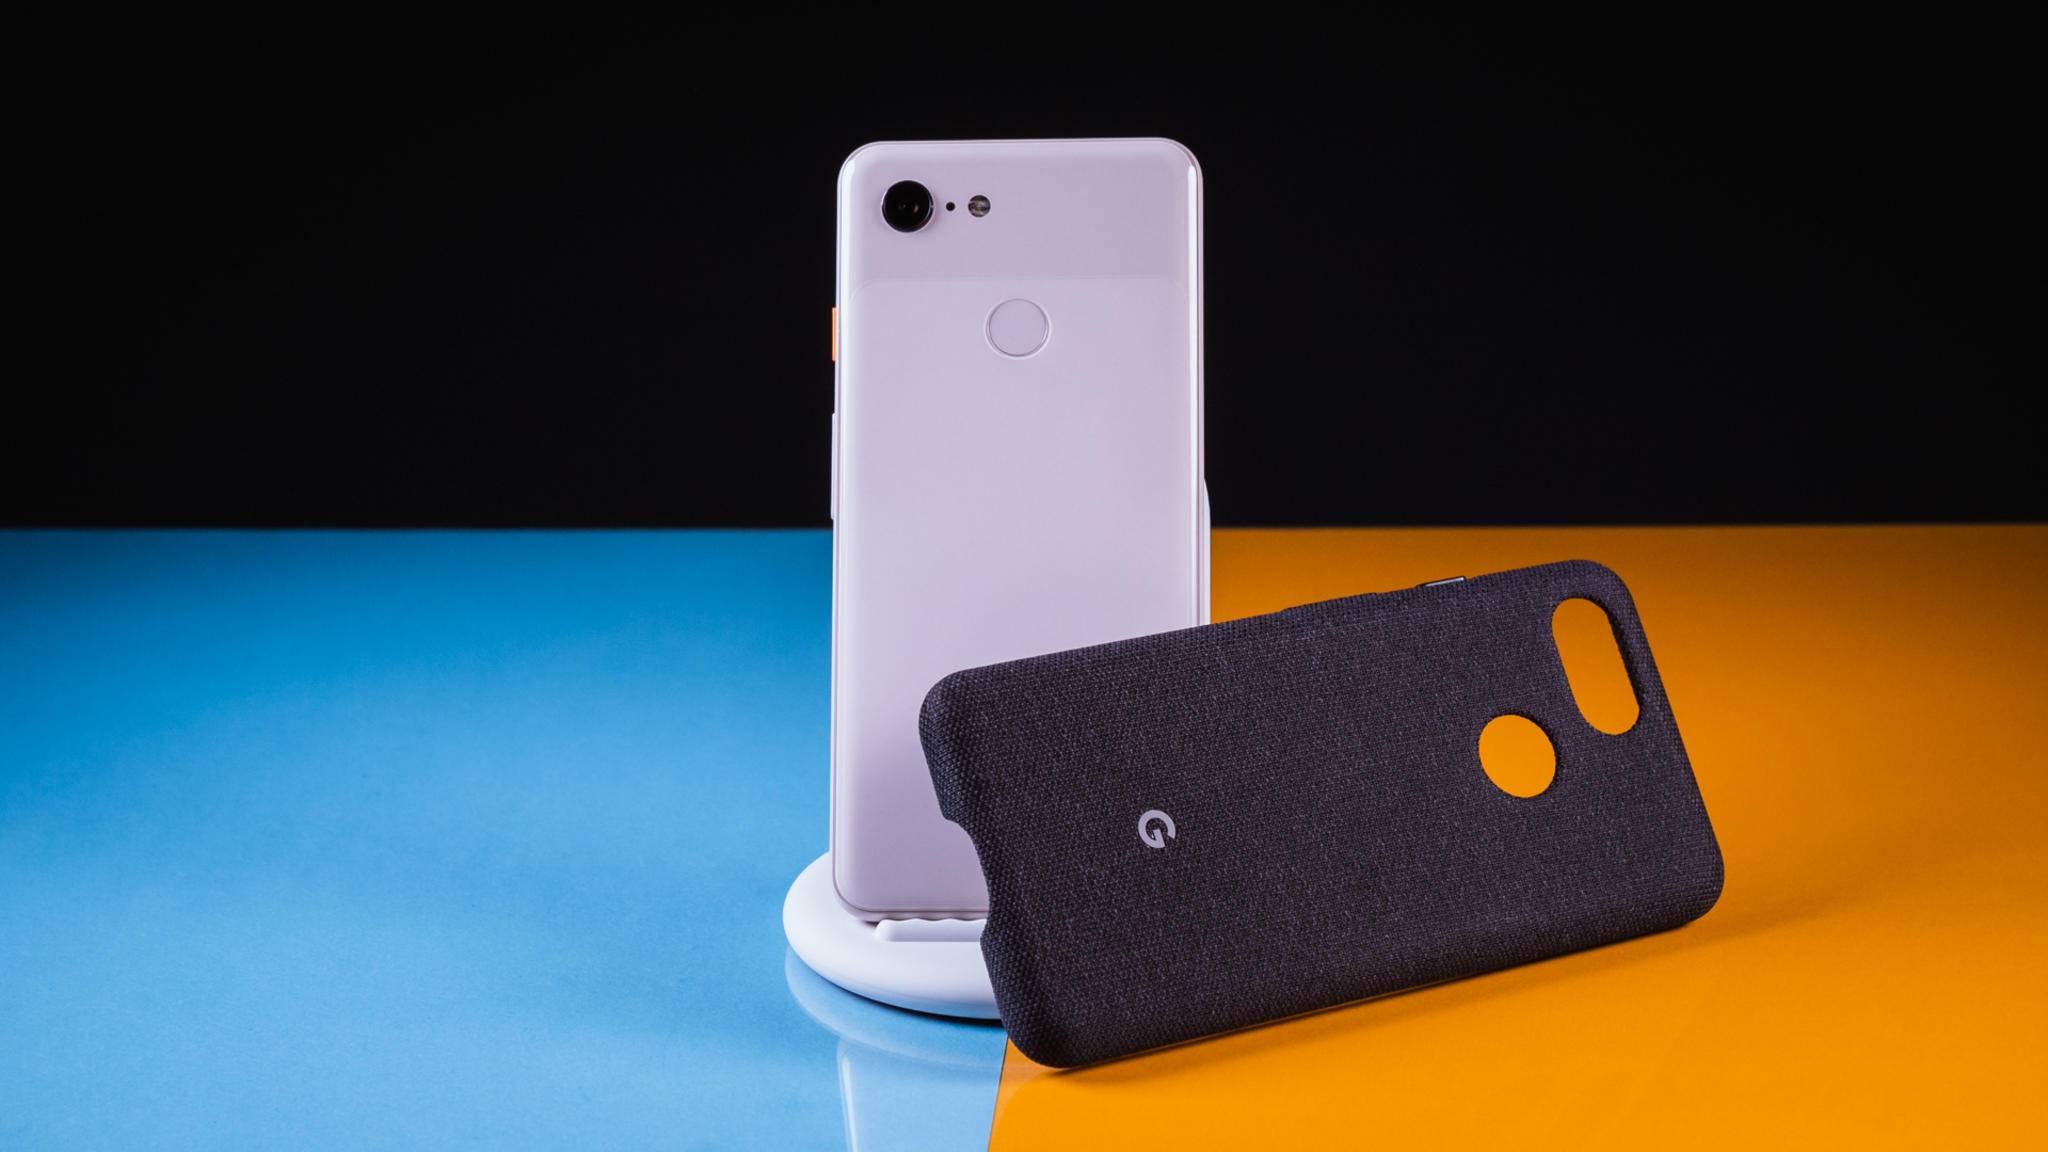 Studie: Google Pixel 3 lässt Apple-Fans eher kalt